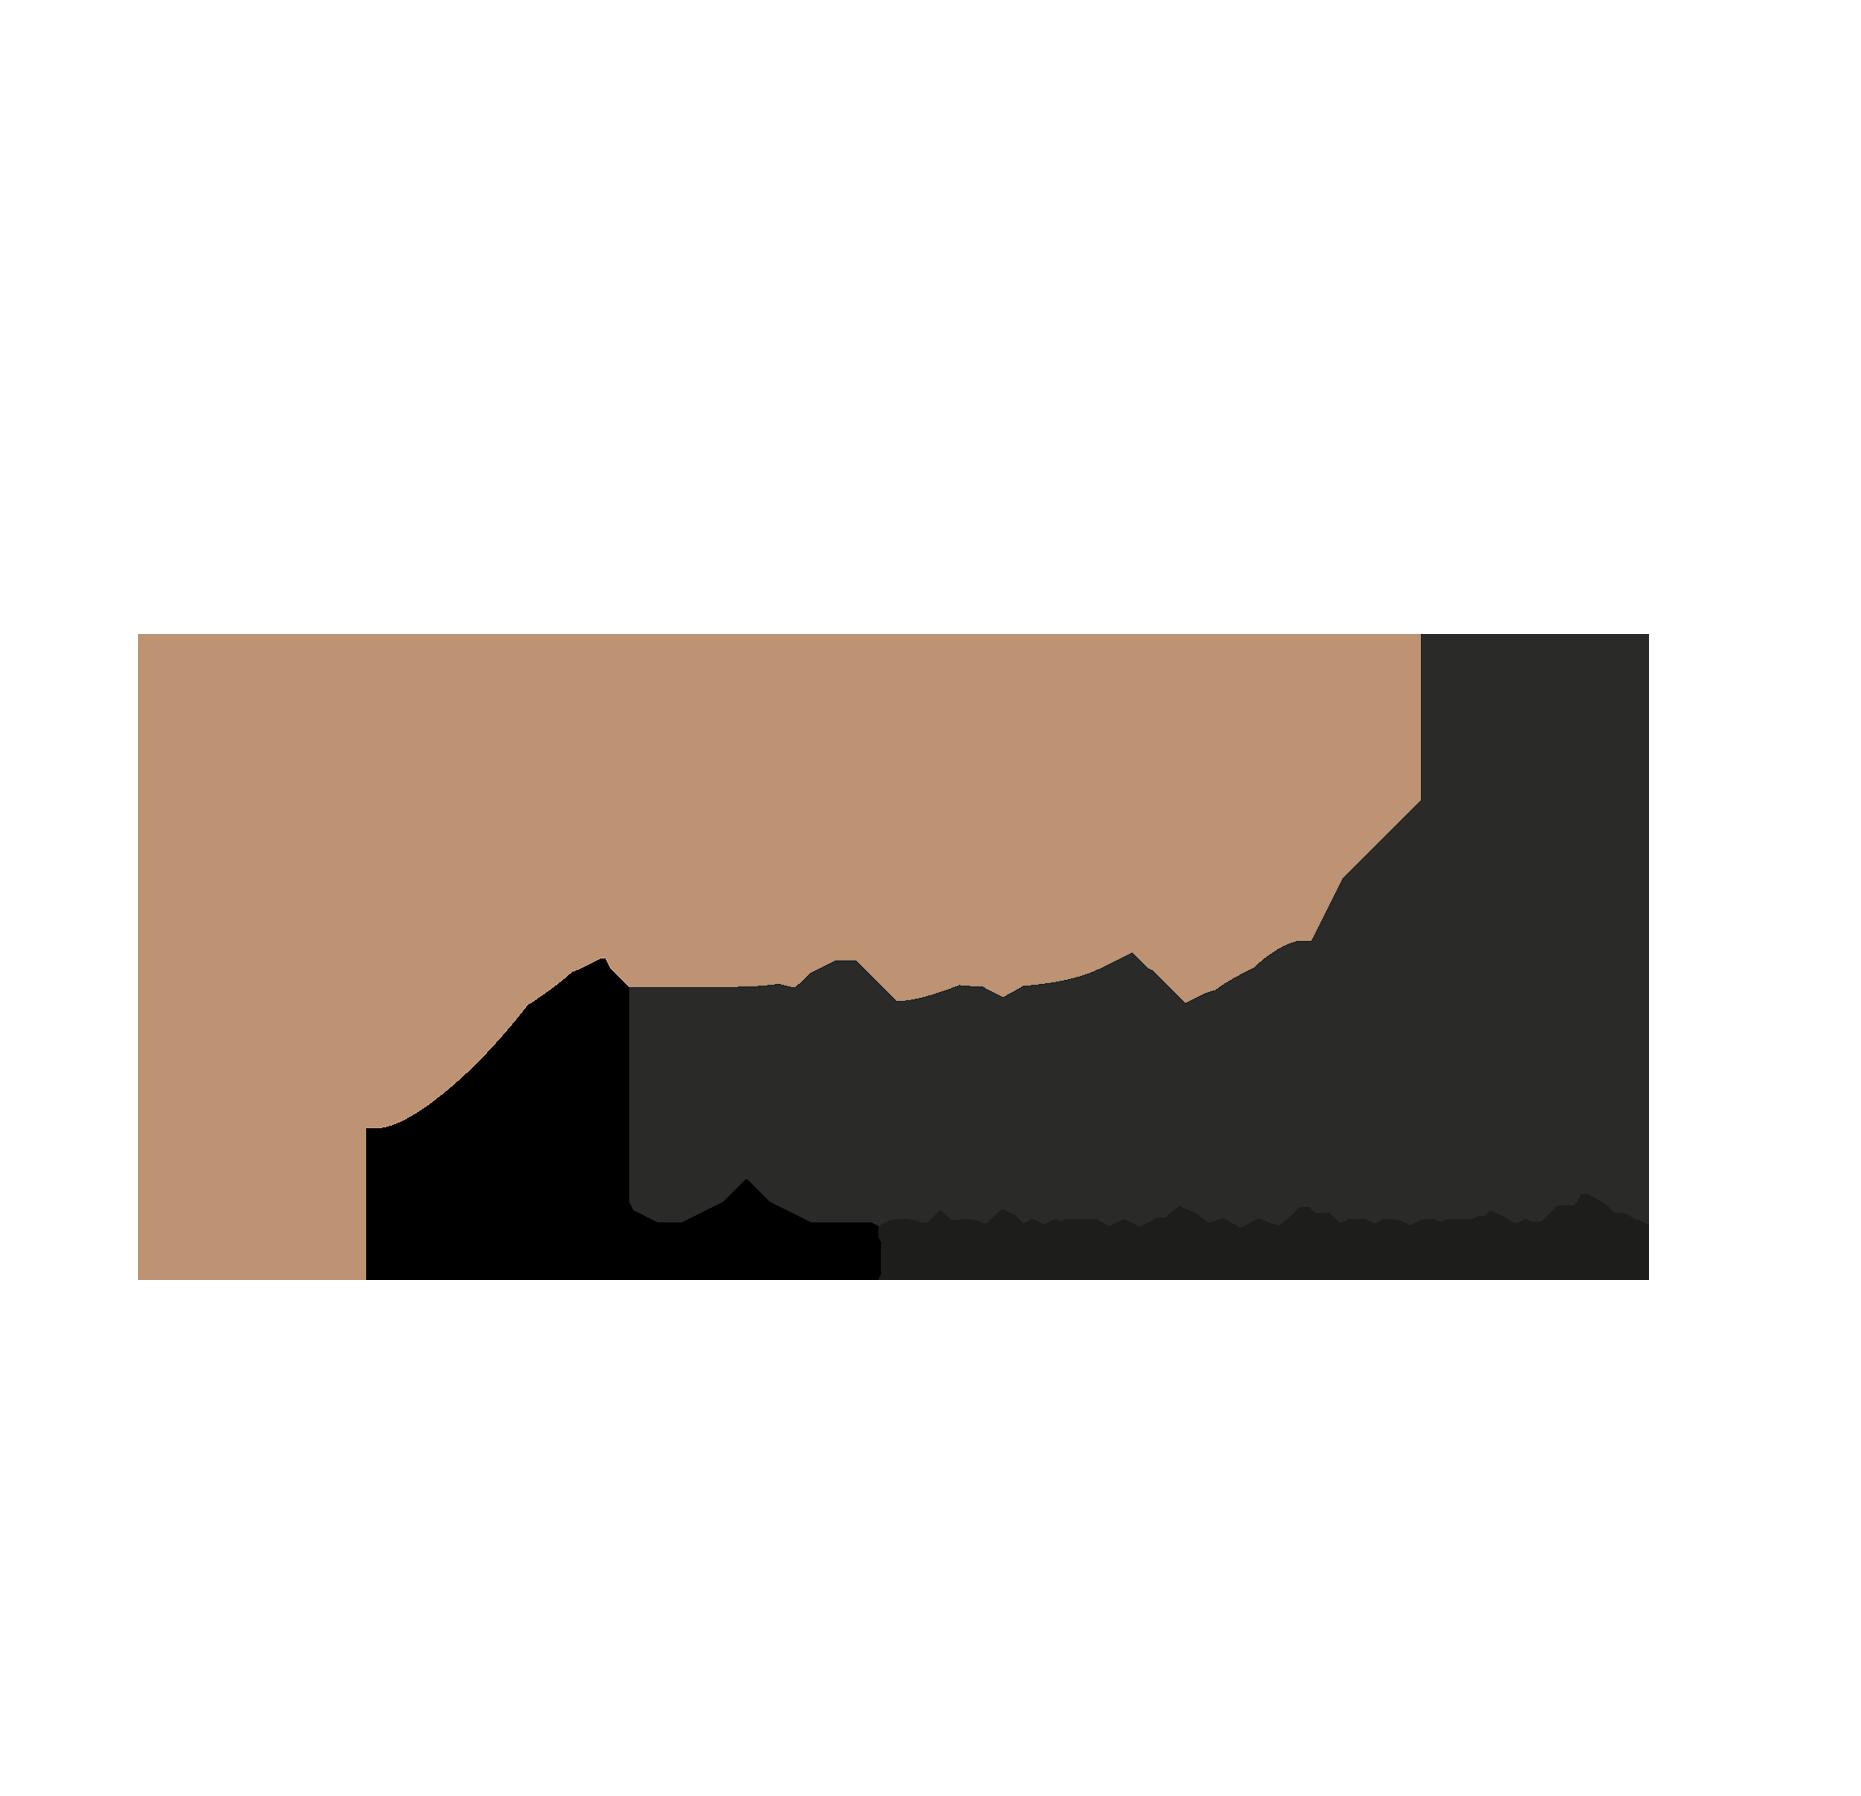 Bobo Fliesen würzburg Logo